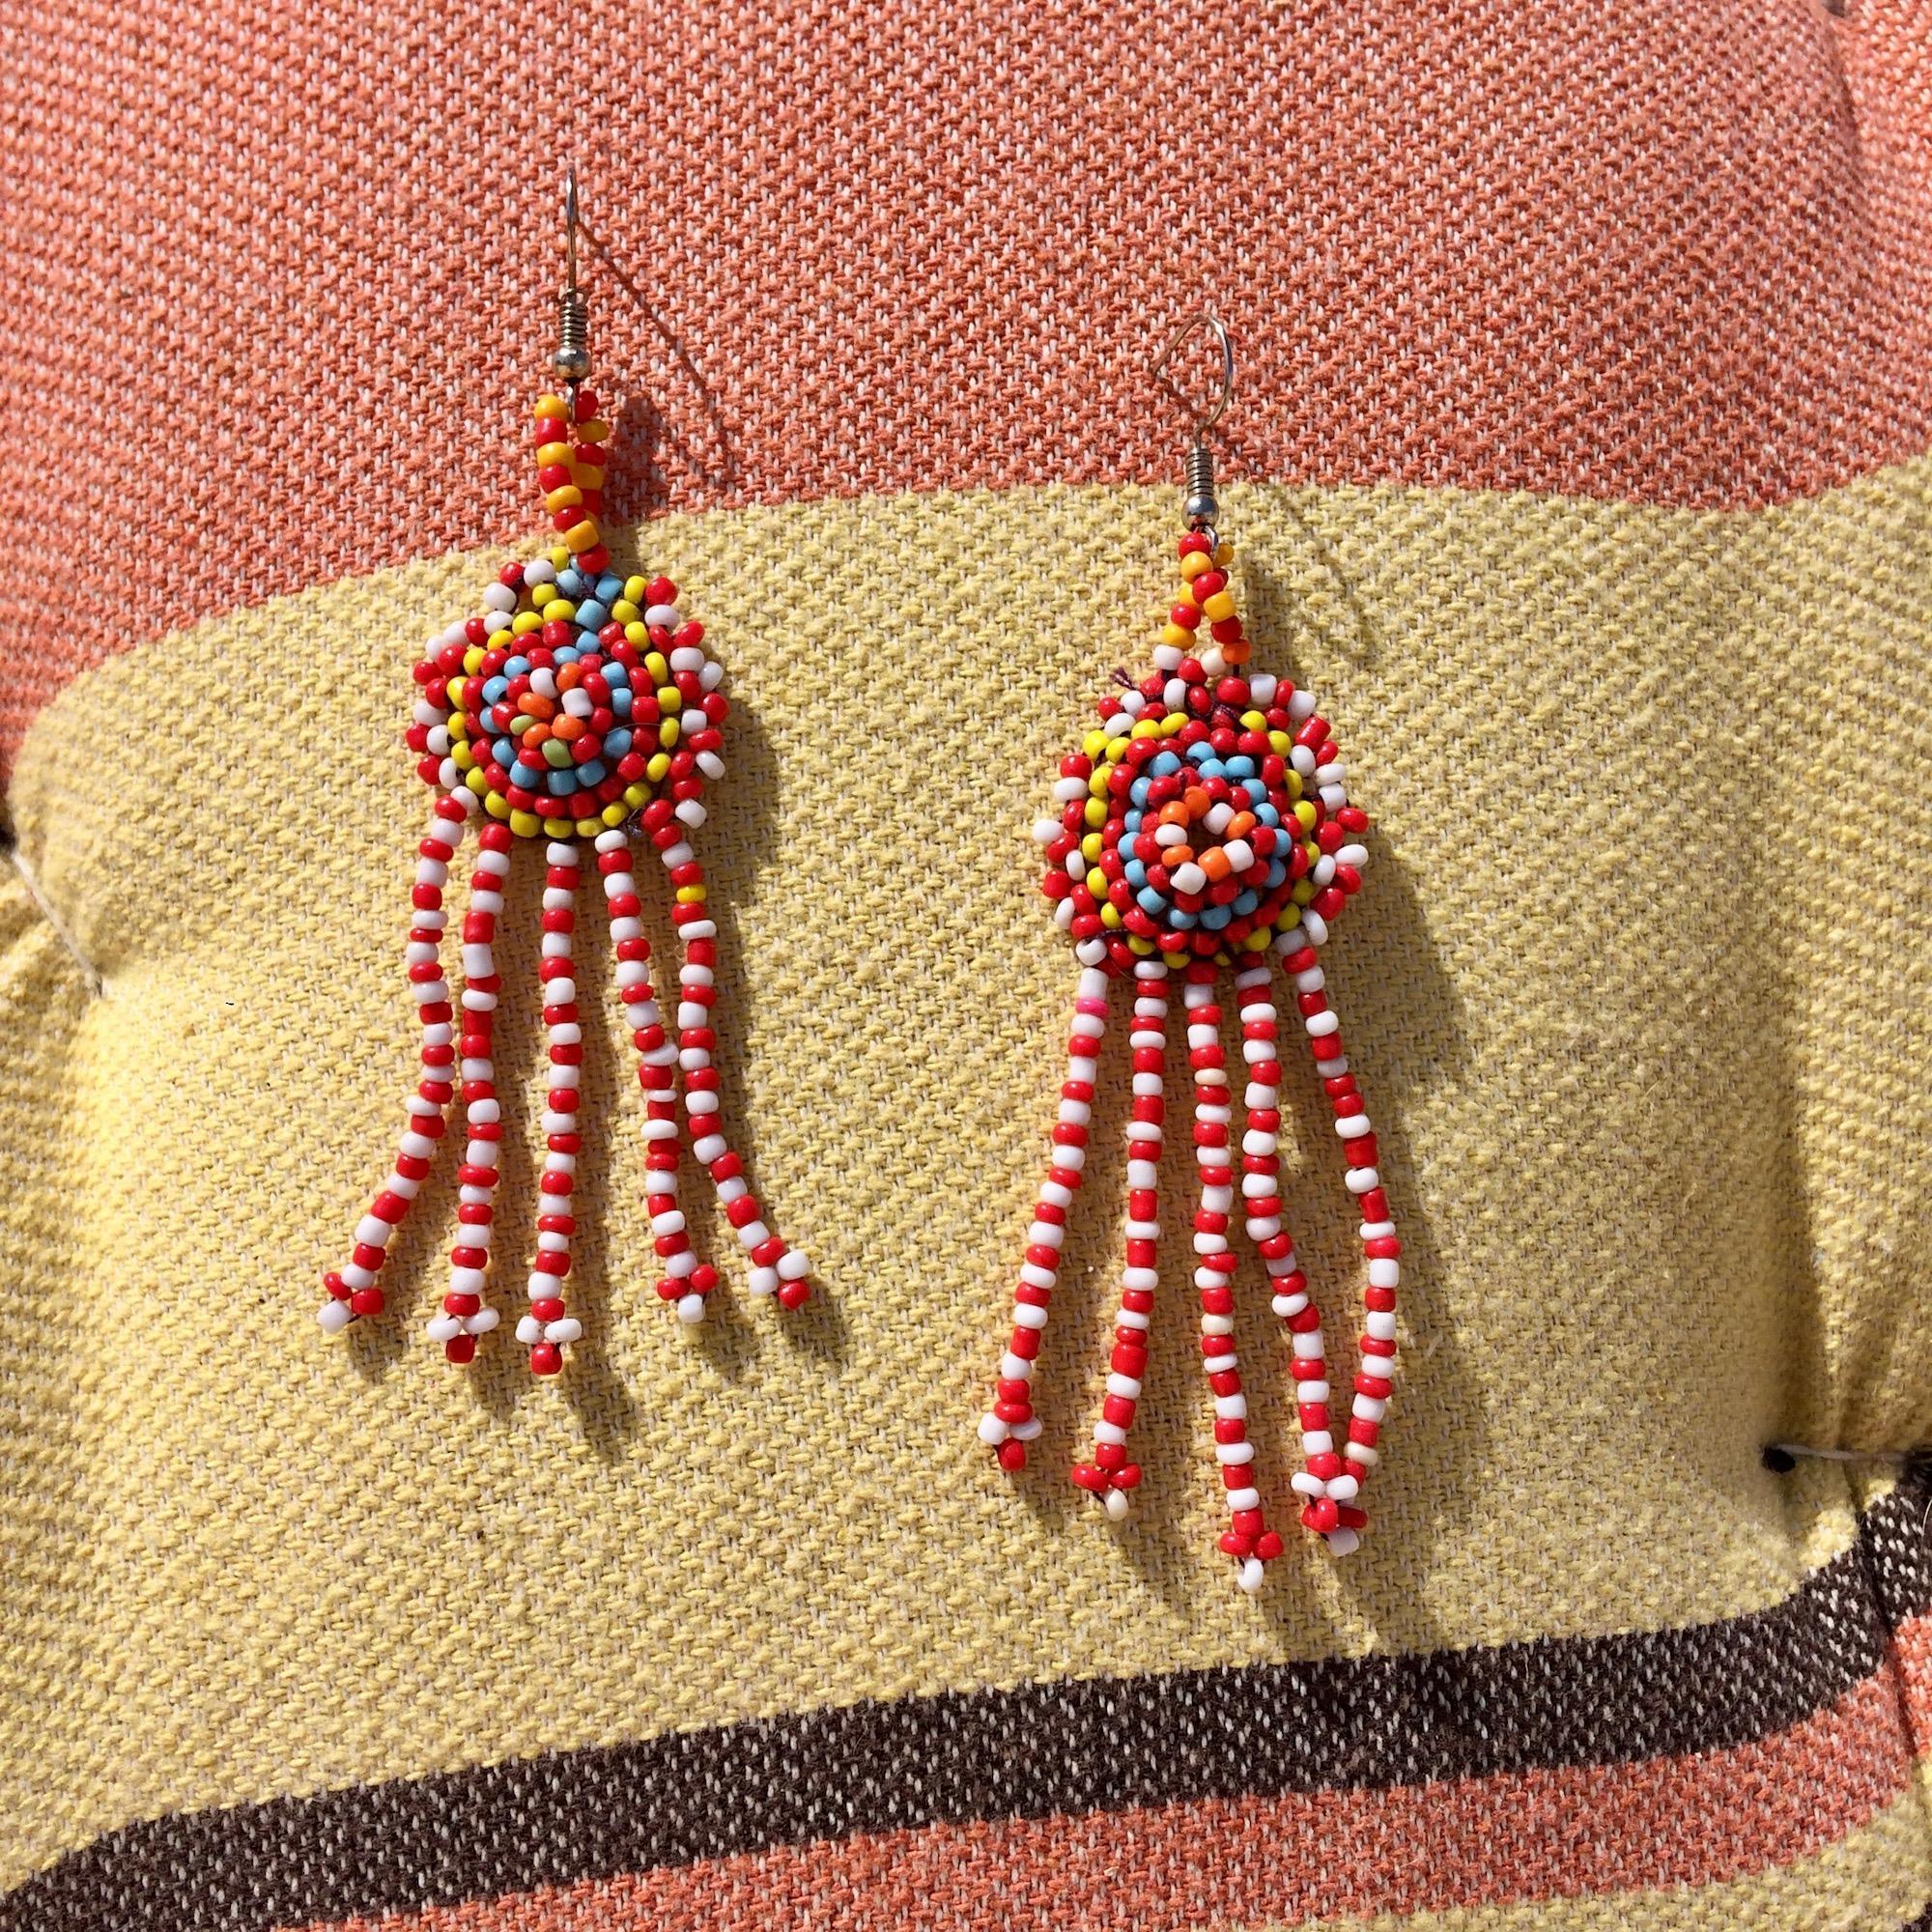 Bedouin Round Beaded Earrings